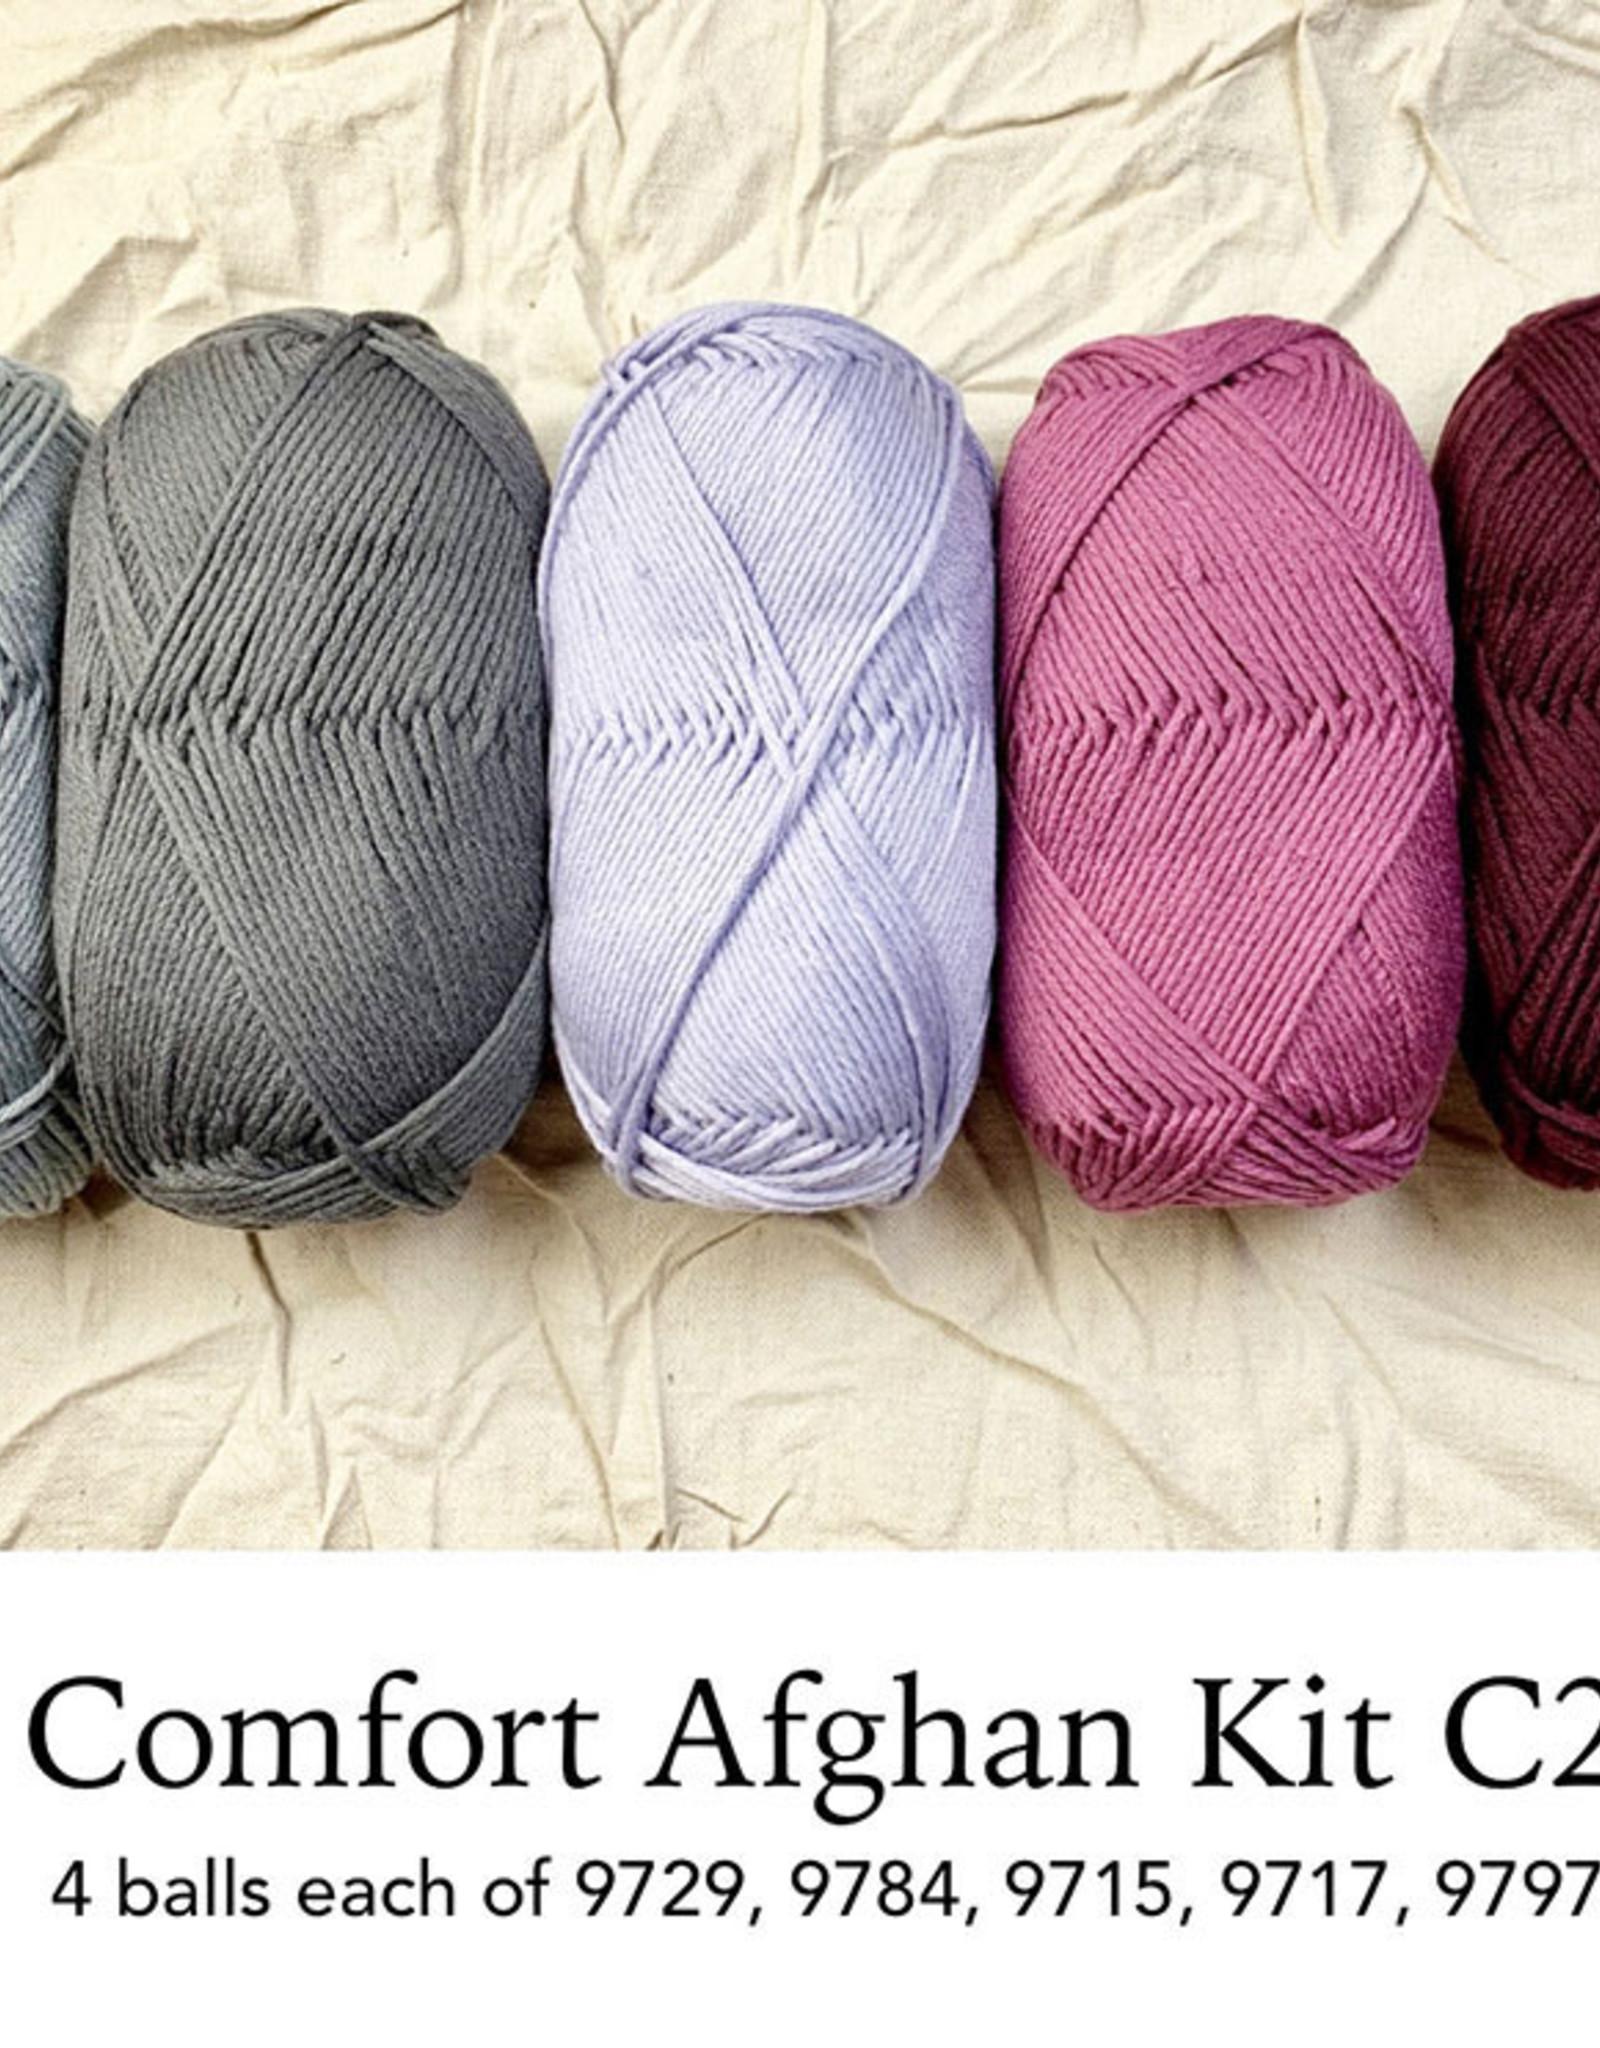 Berroco Afghan Kit